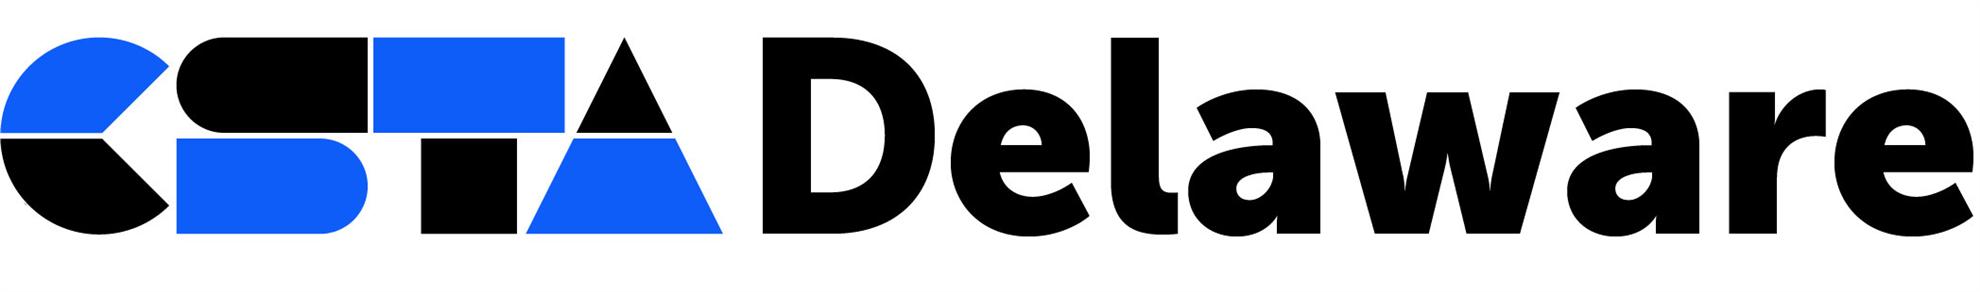 CSTA Delaware logo